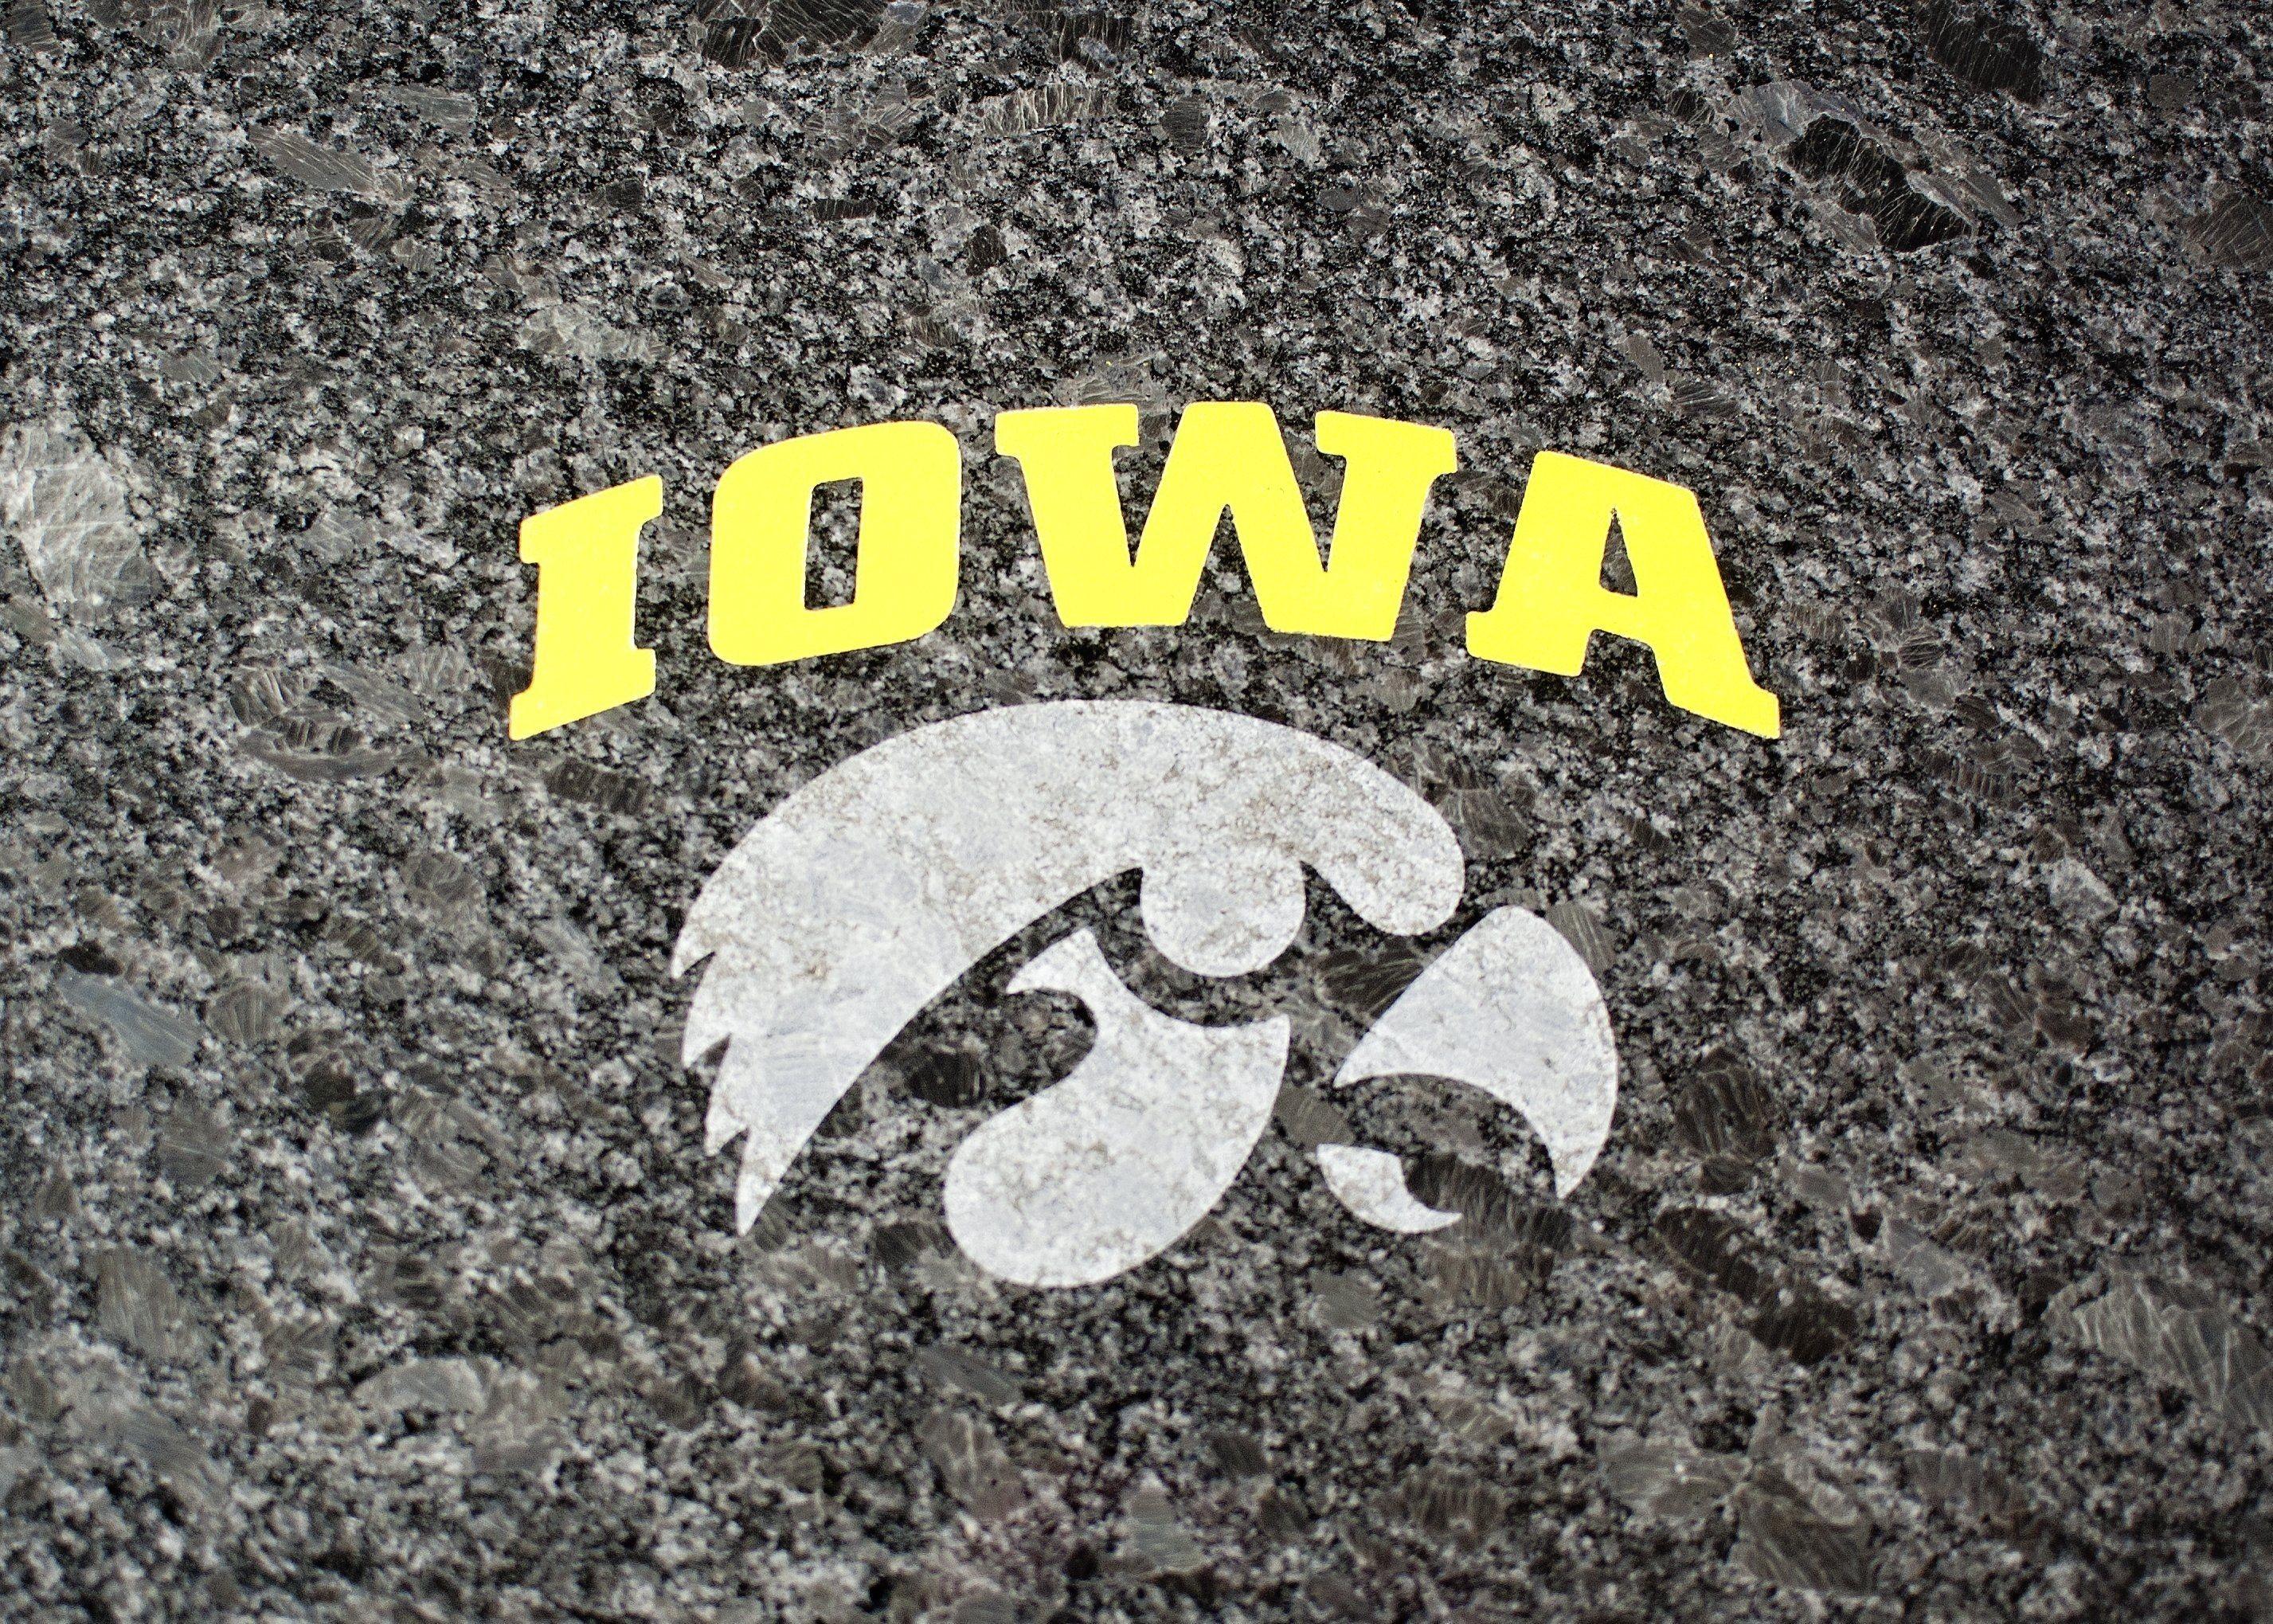 68 Iowa Hawkeyes Wallpapers on WallpaperPlay 2854x2039